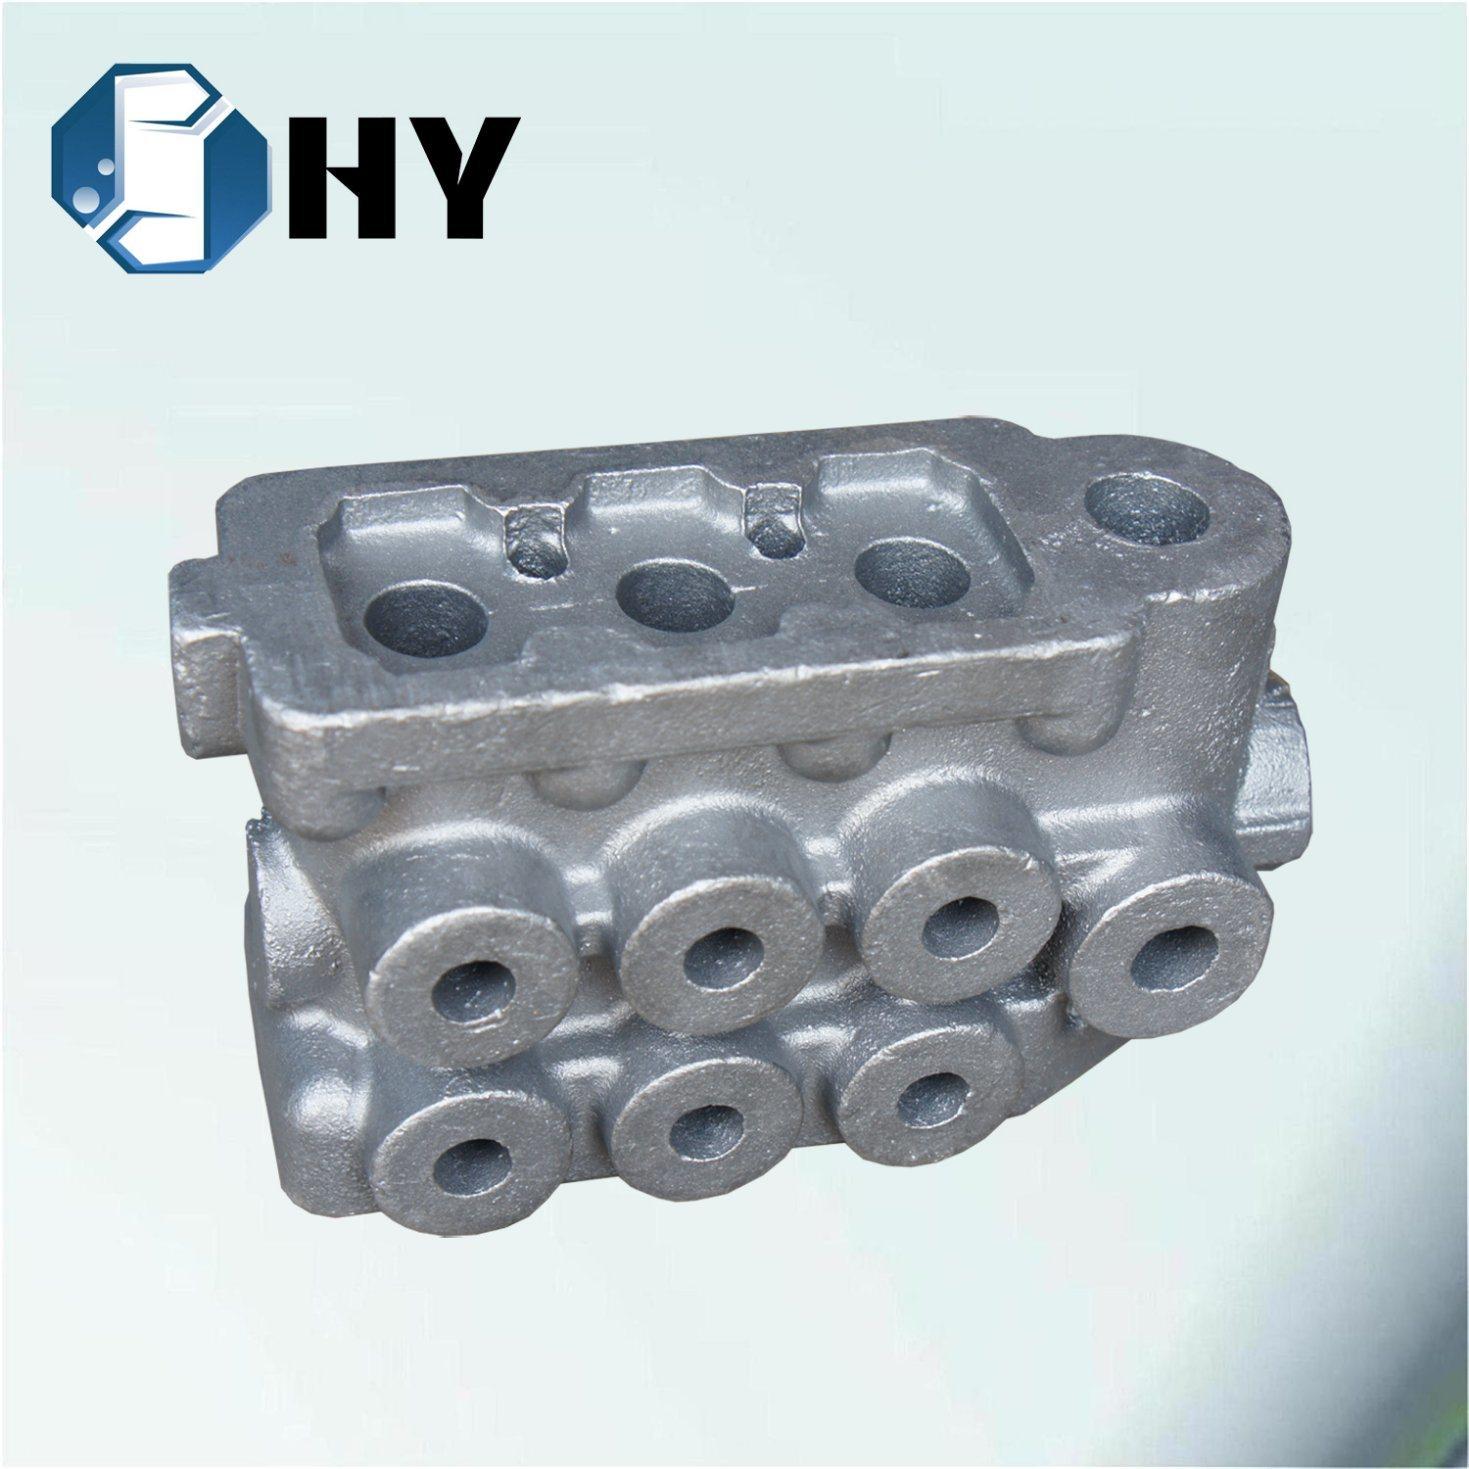 Nodular Cast Iron Resin Sand Casting for Agriculture Hydraulic Valve